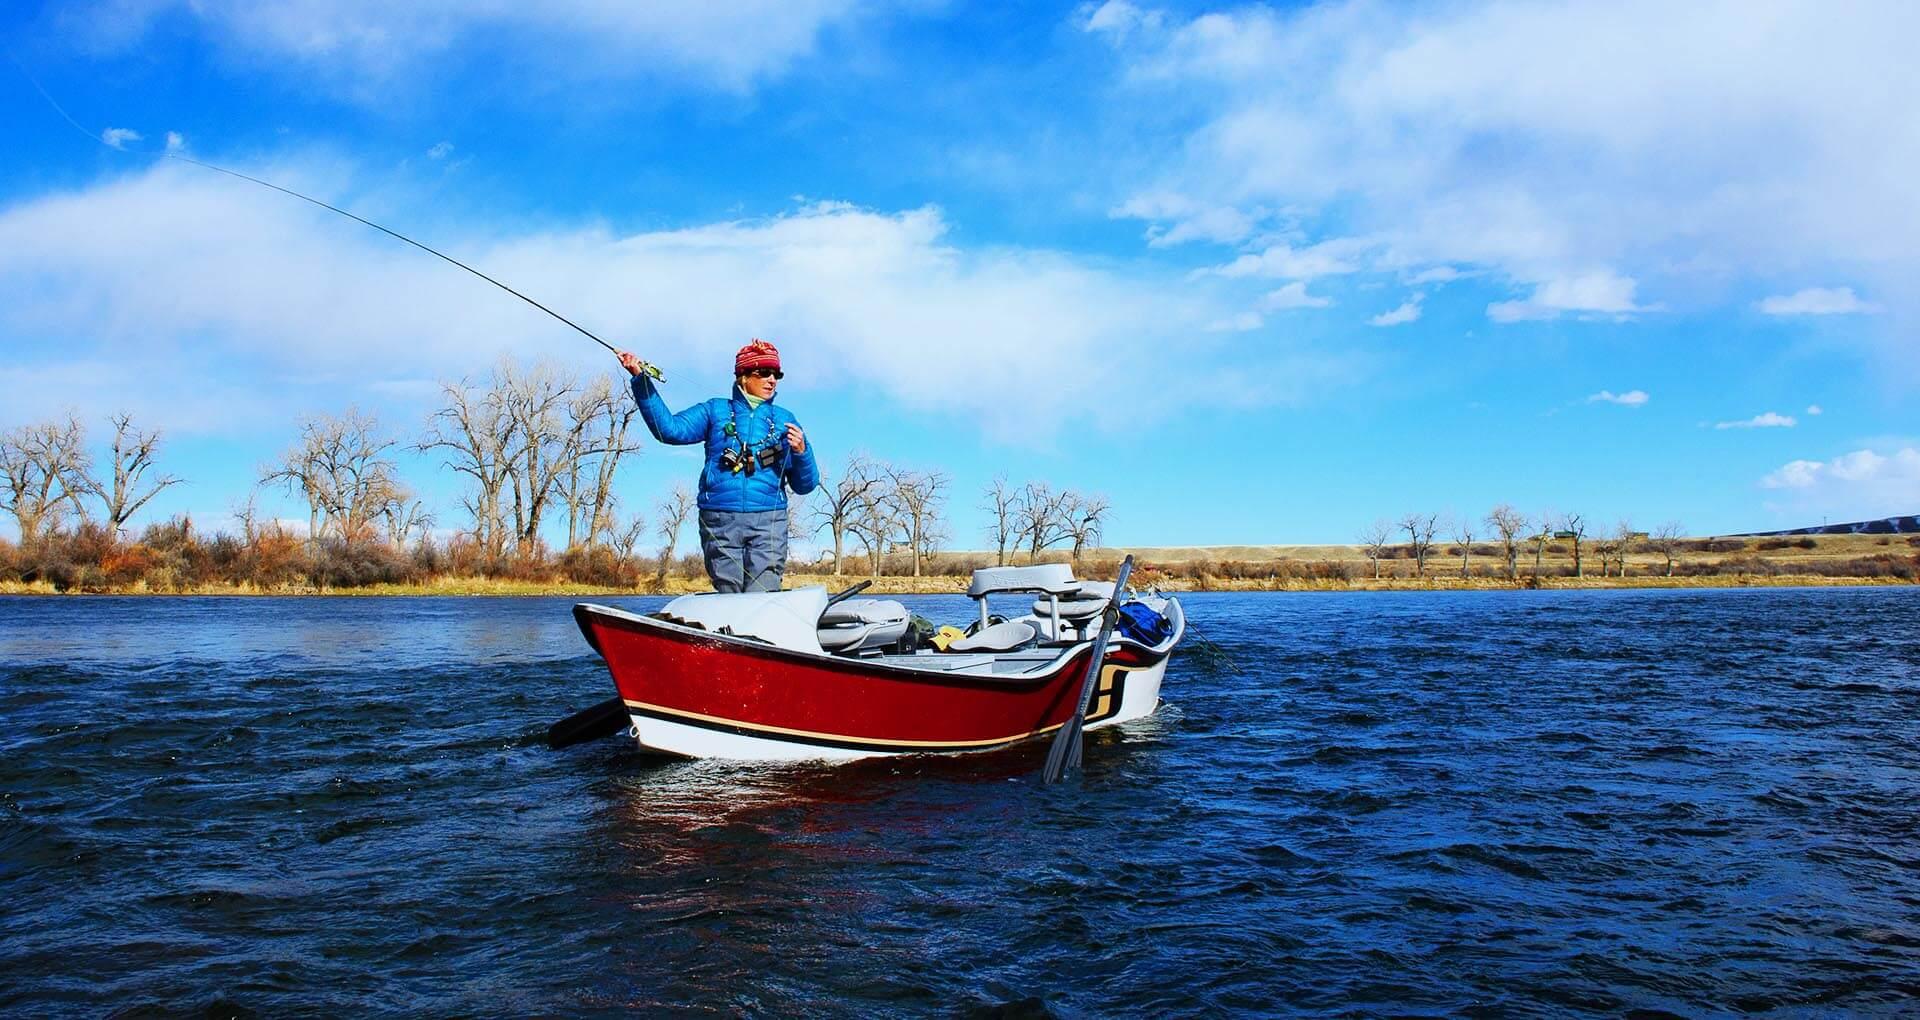 Woman Fishing from a Drift Boat